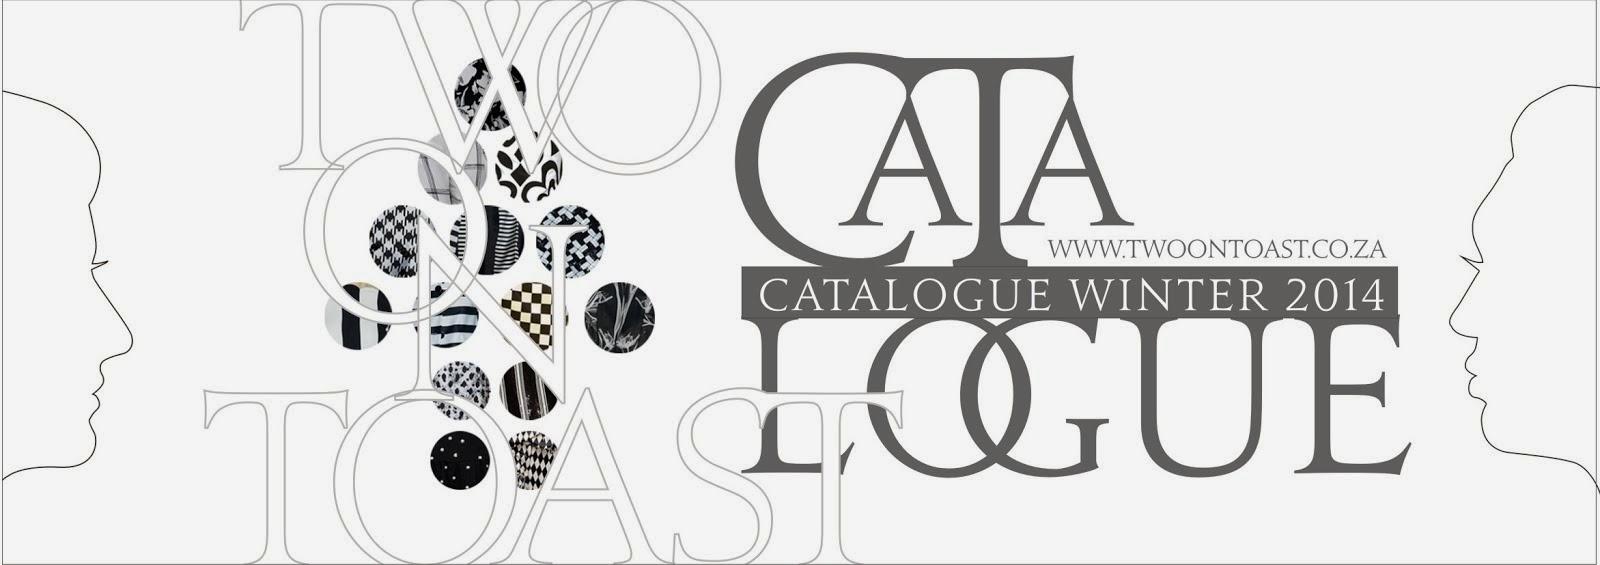 Catalogue Winter 2014